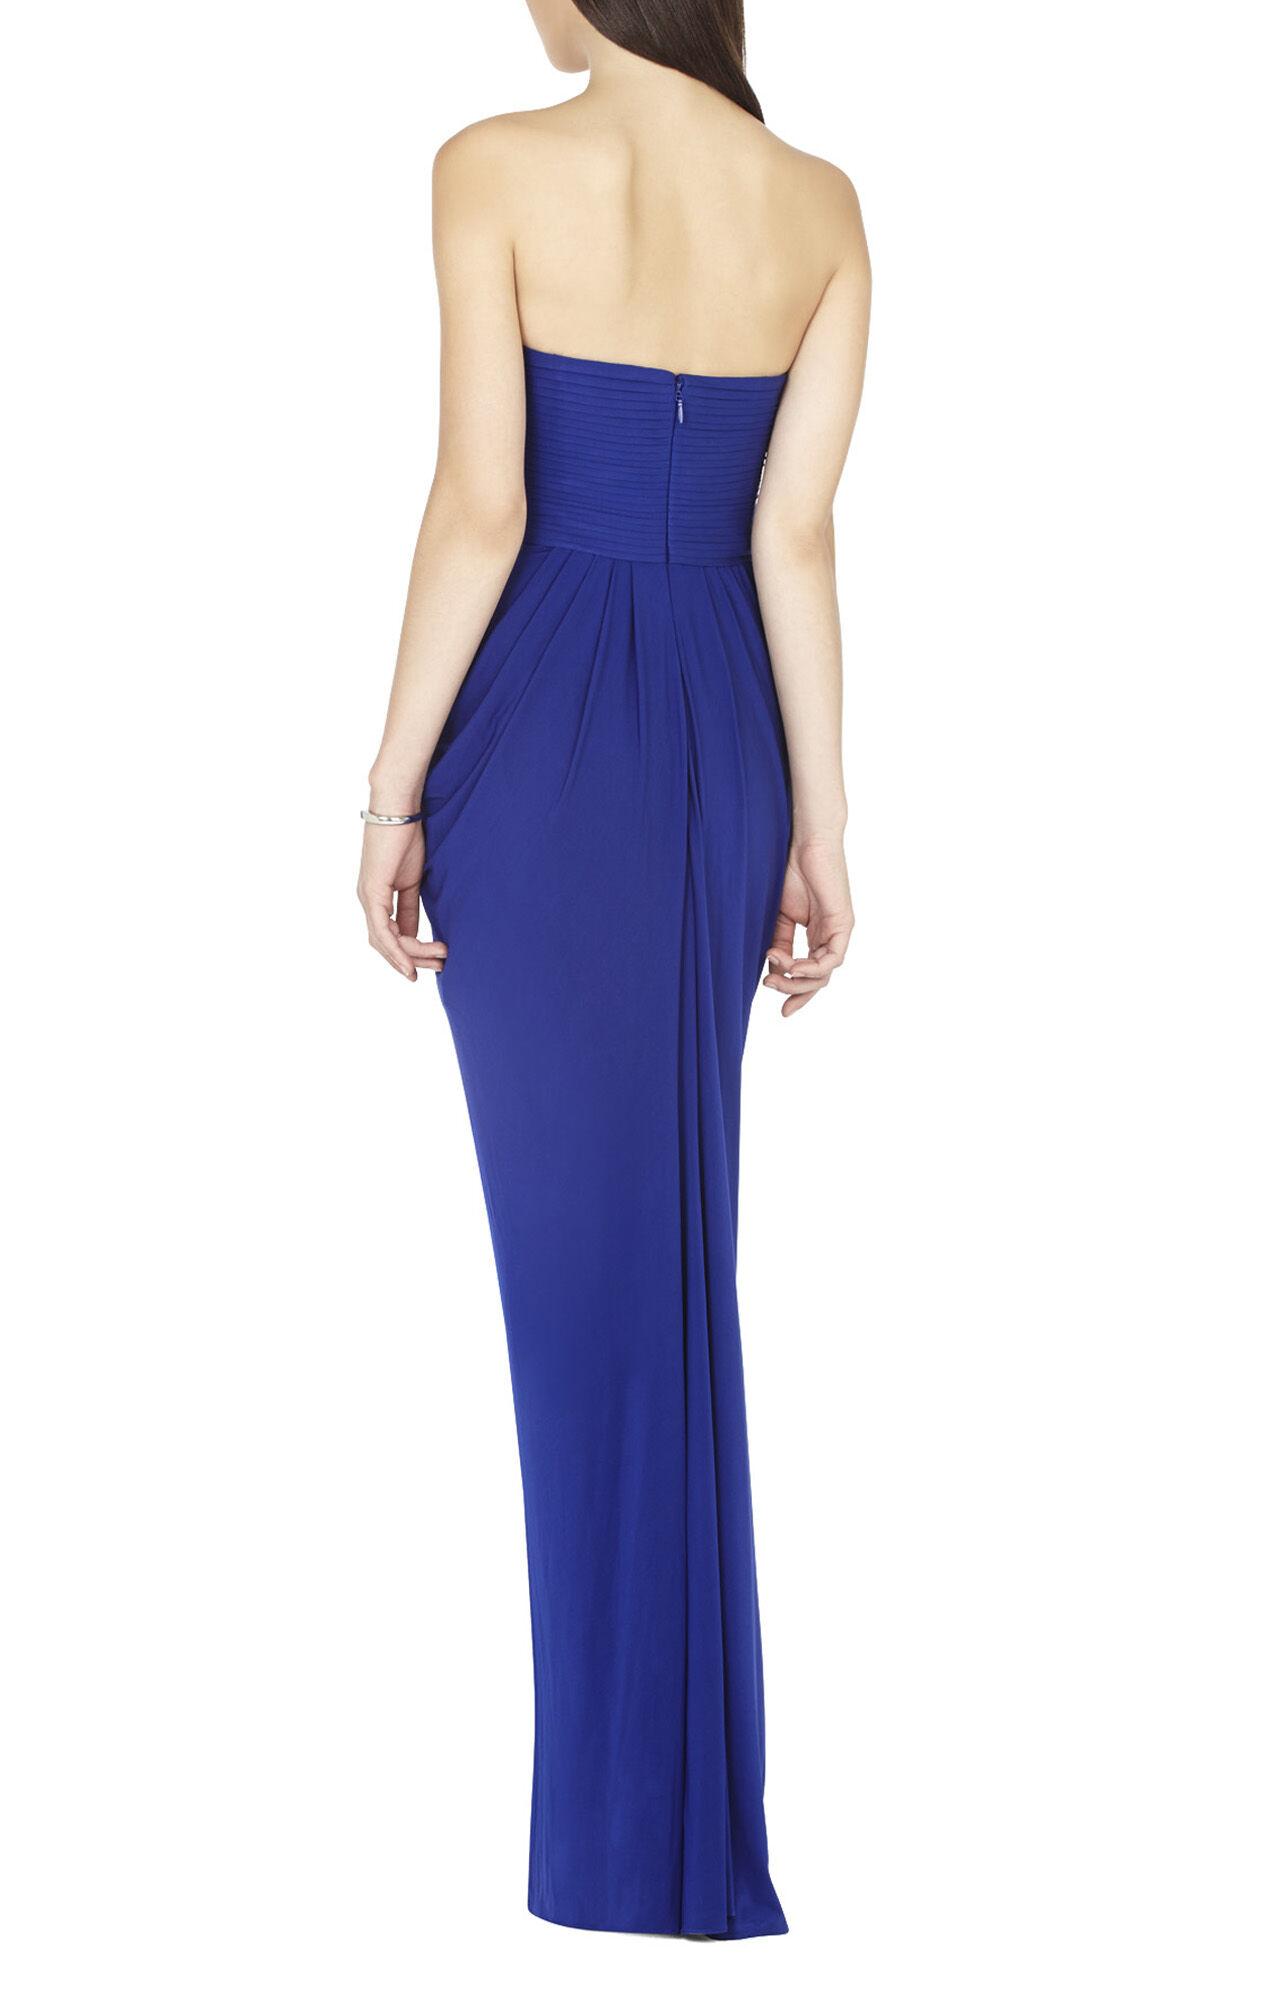 Simona Strapless Draped High-Slit Gown